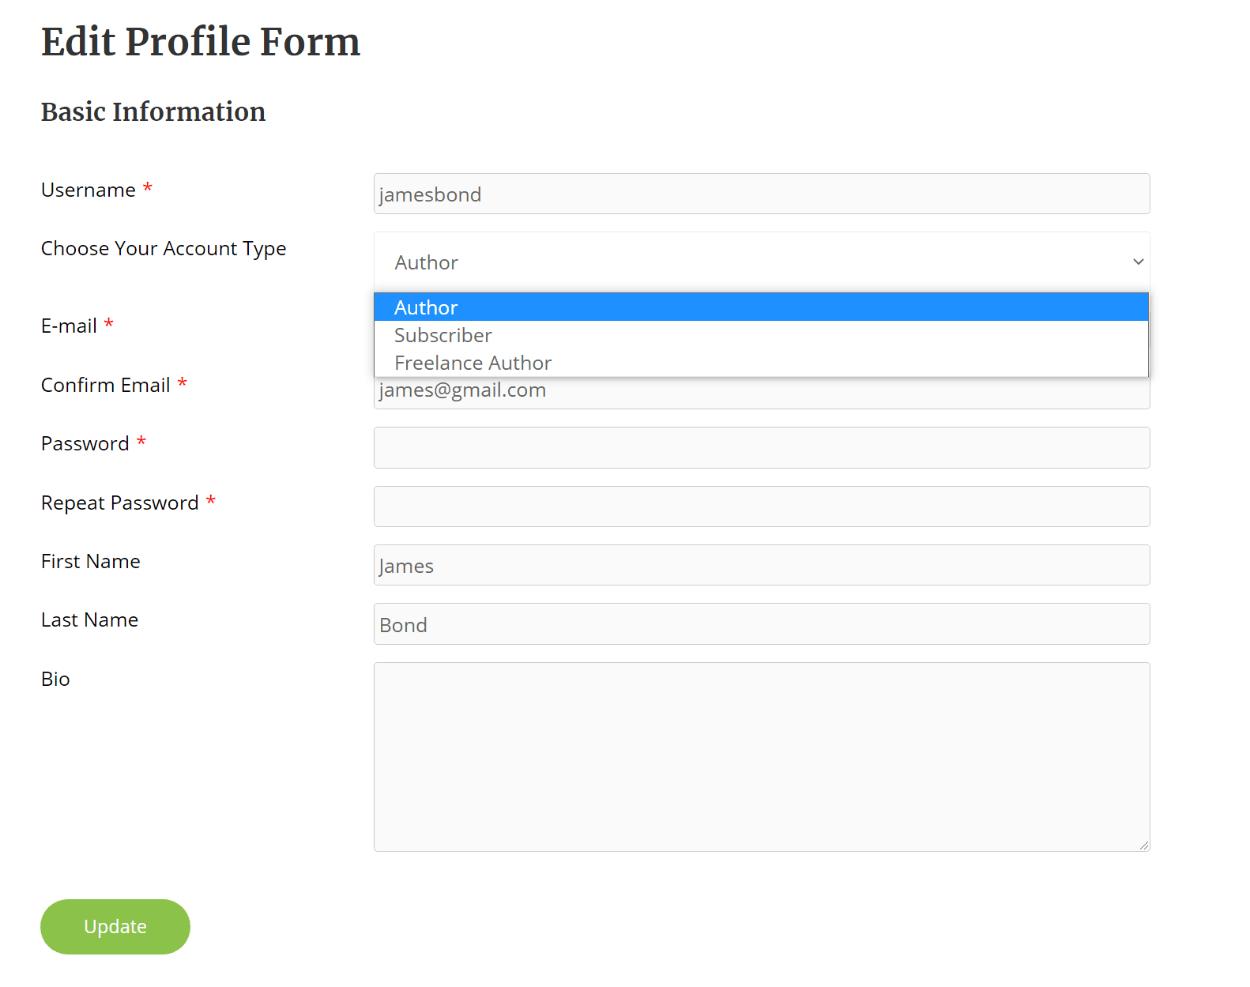 Edit profile forms